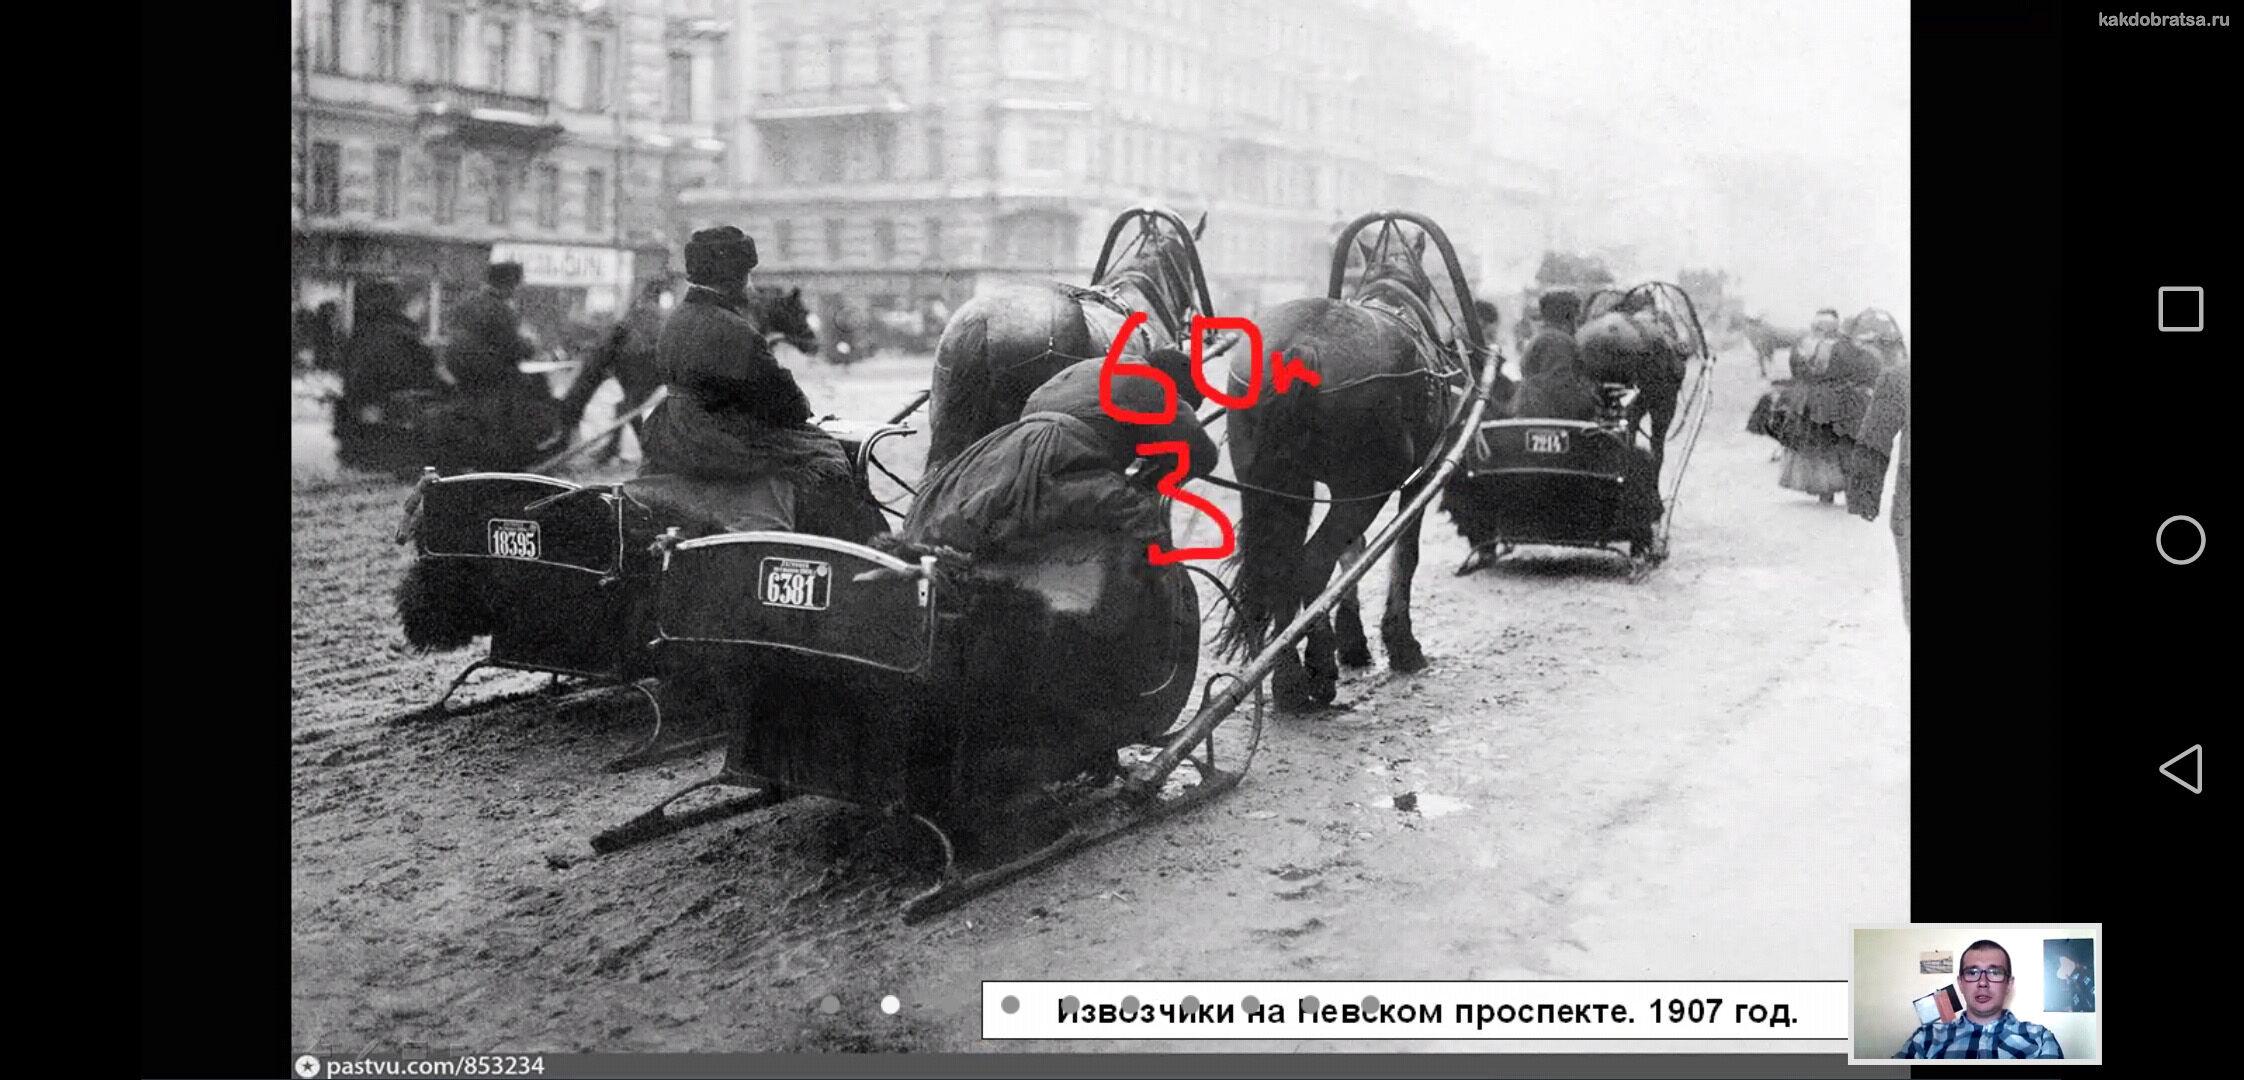 Перевозки на лошадях в дореволюционном Ленинграде